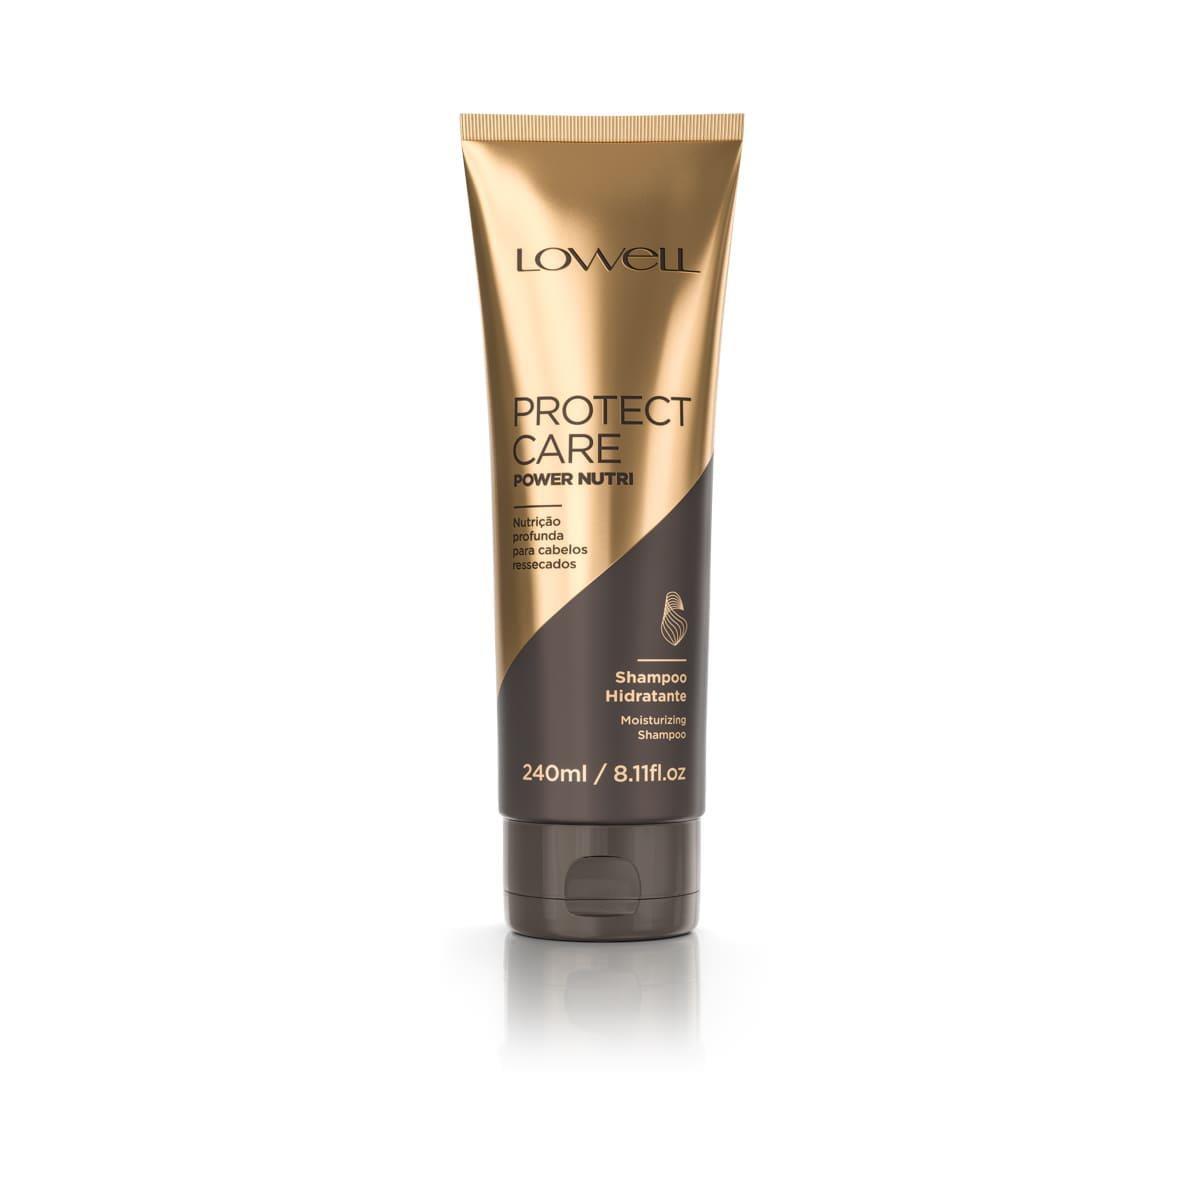 Lowell Shampoo Protect Care Power Nutri - 240ml